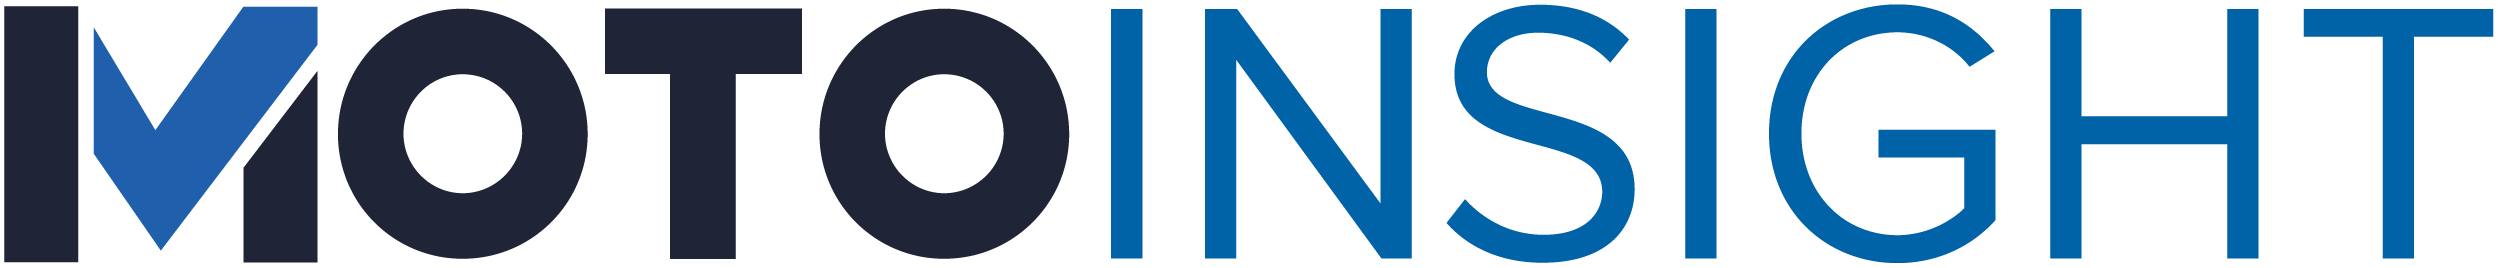 MotoInsight_Logo_Navigation.png